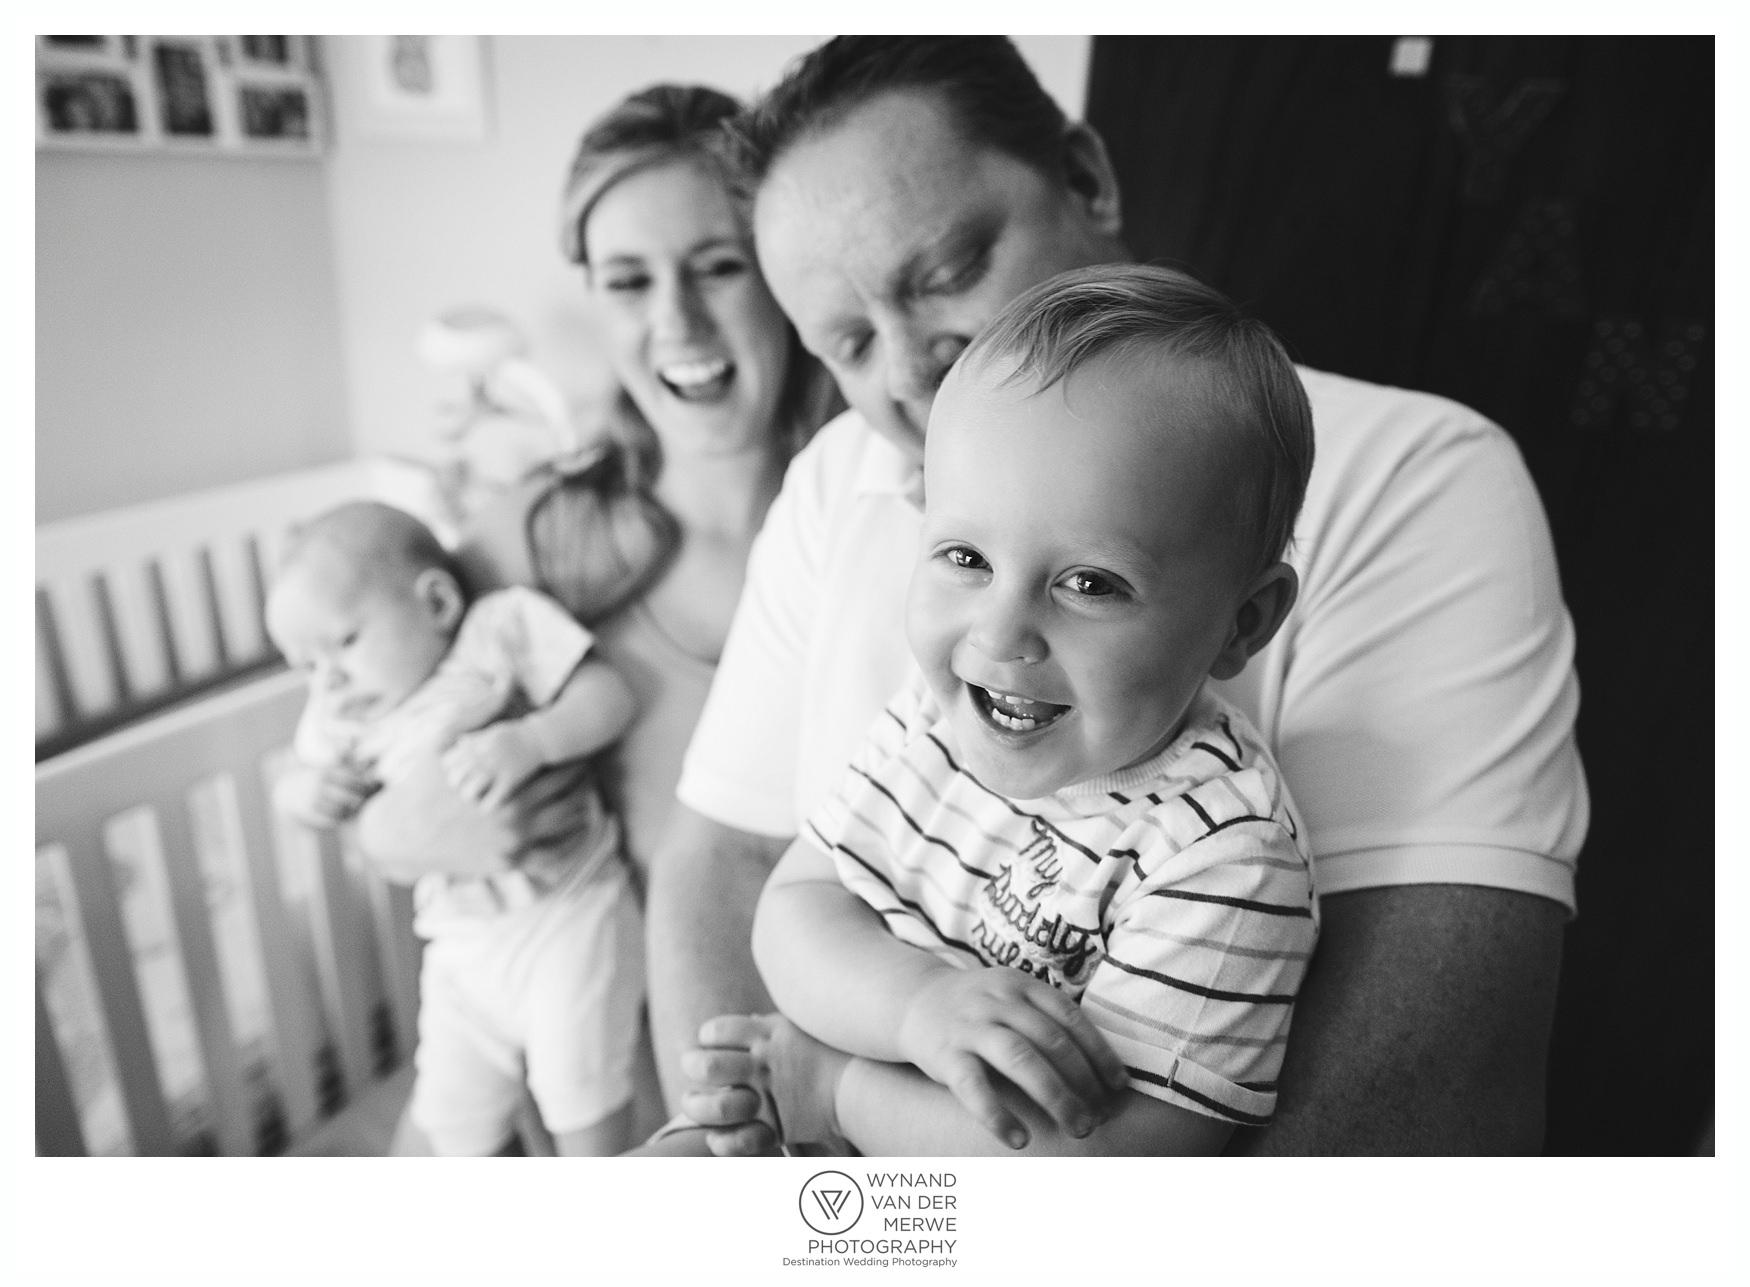 Wynandvandermerwe kirsten robert family lifestyle photography benoni location gauteng-87.jpg